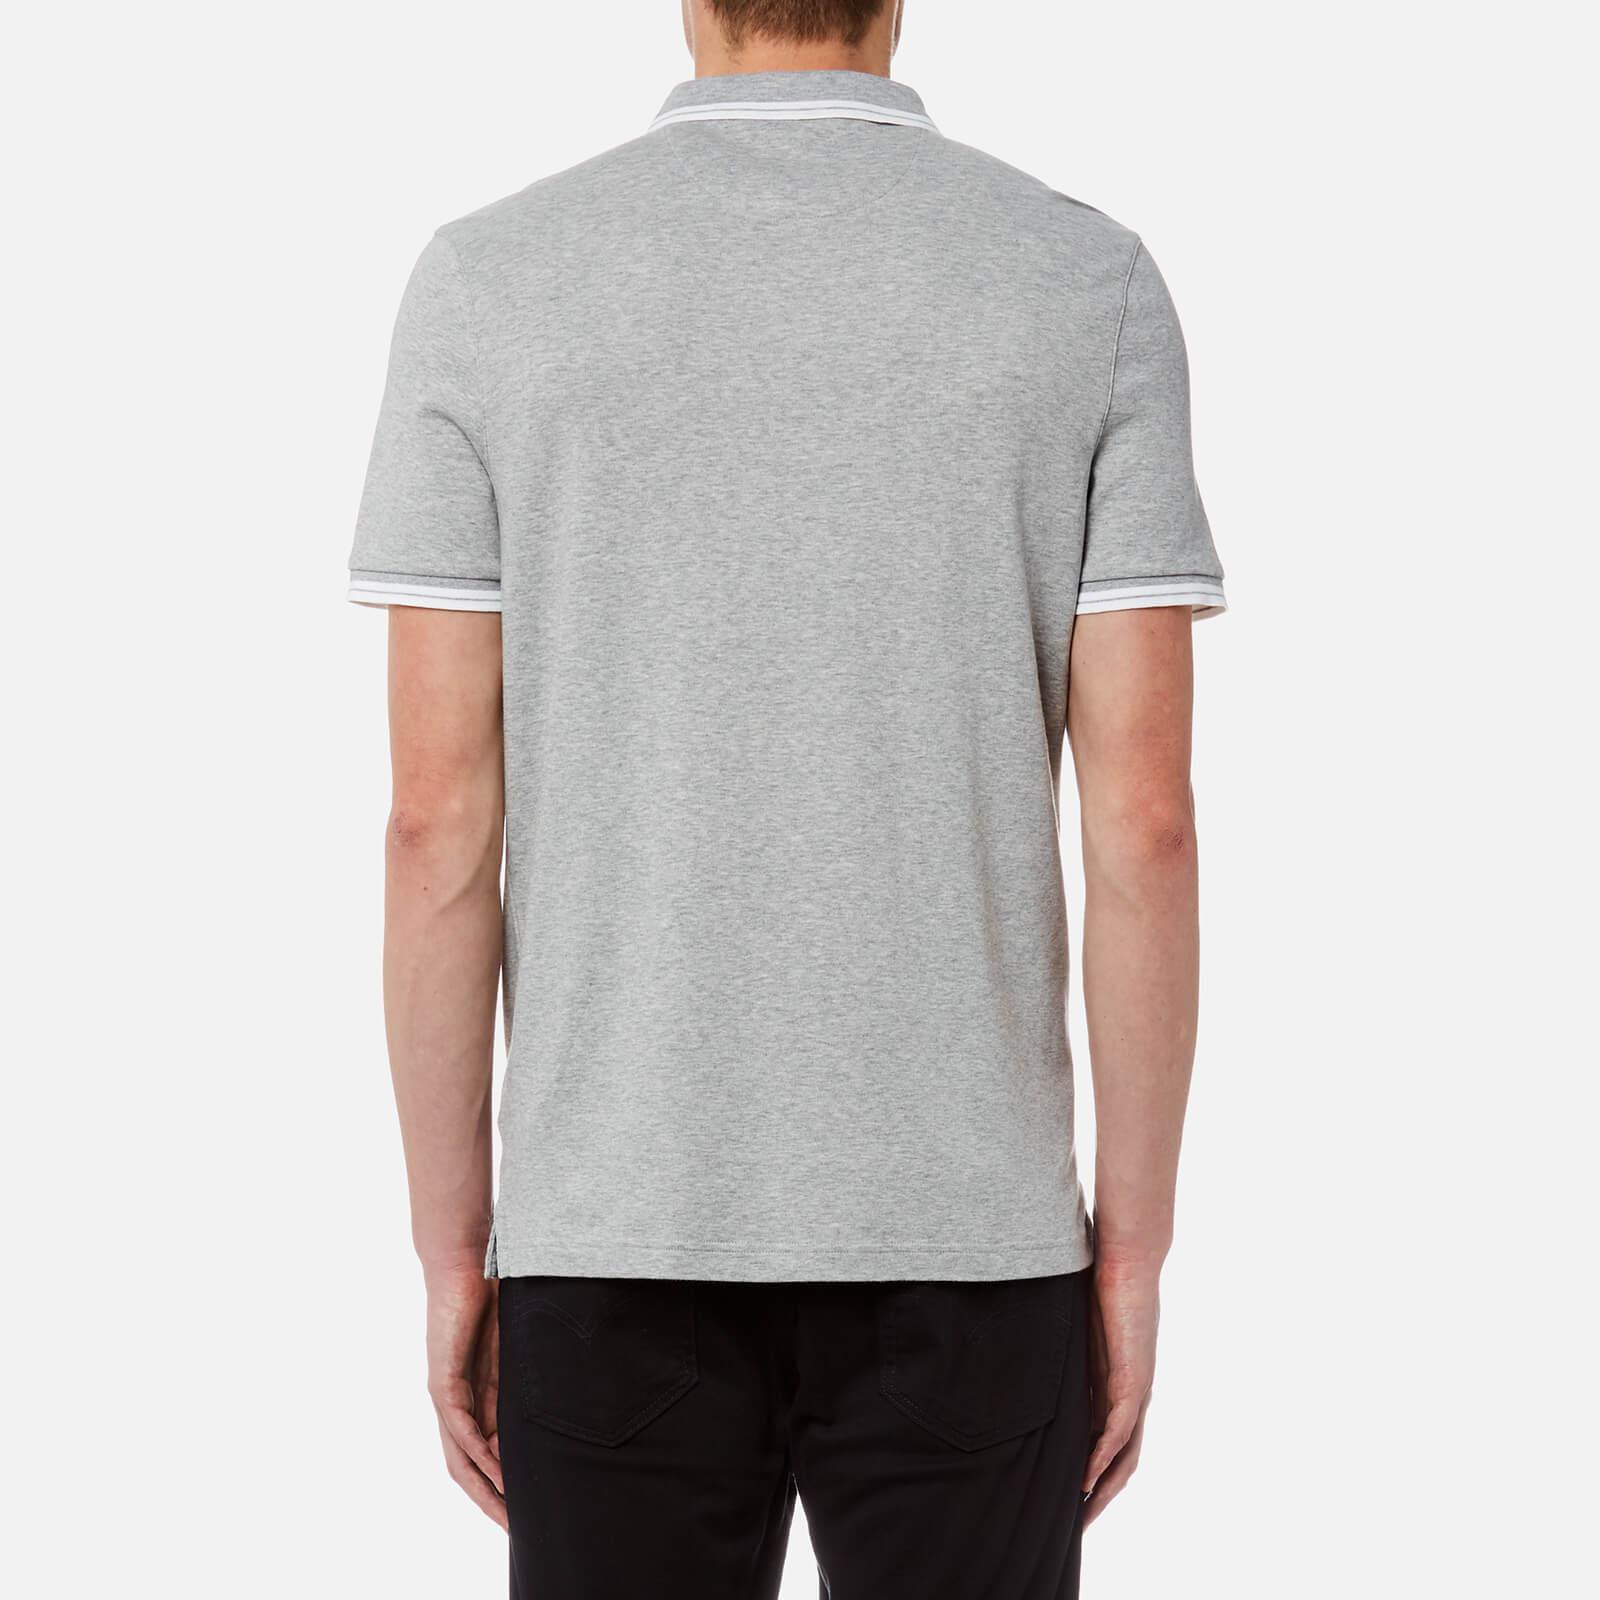 e7126d58 Michael Kors - Gray Greenwich Logo Jacquard Short Sleeve Polo Shirt for Men  - Lyst. View fullscreen